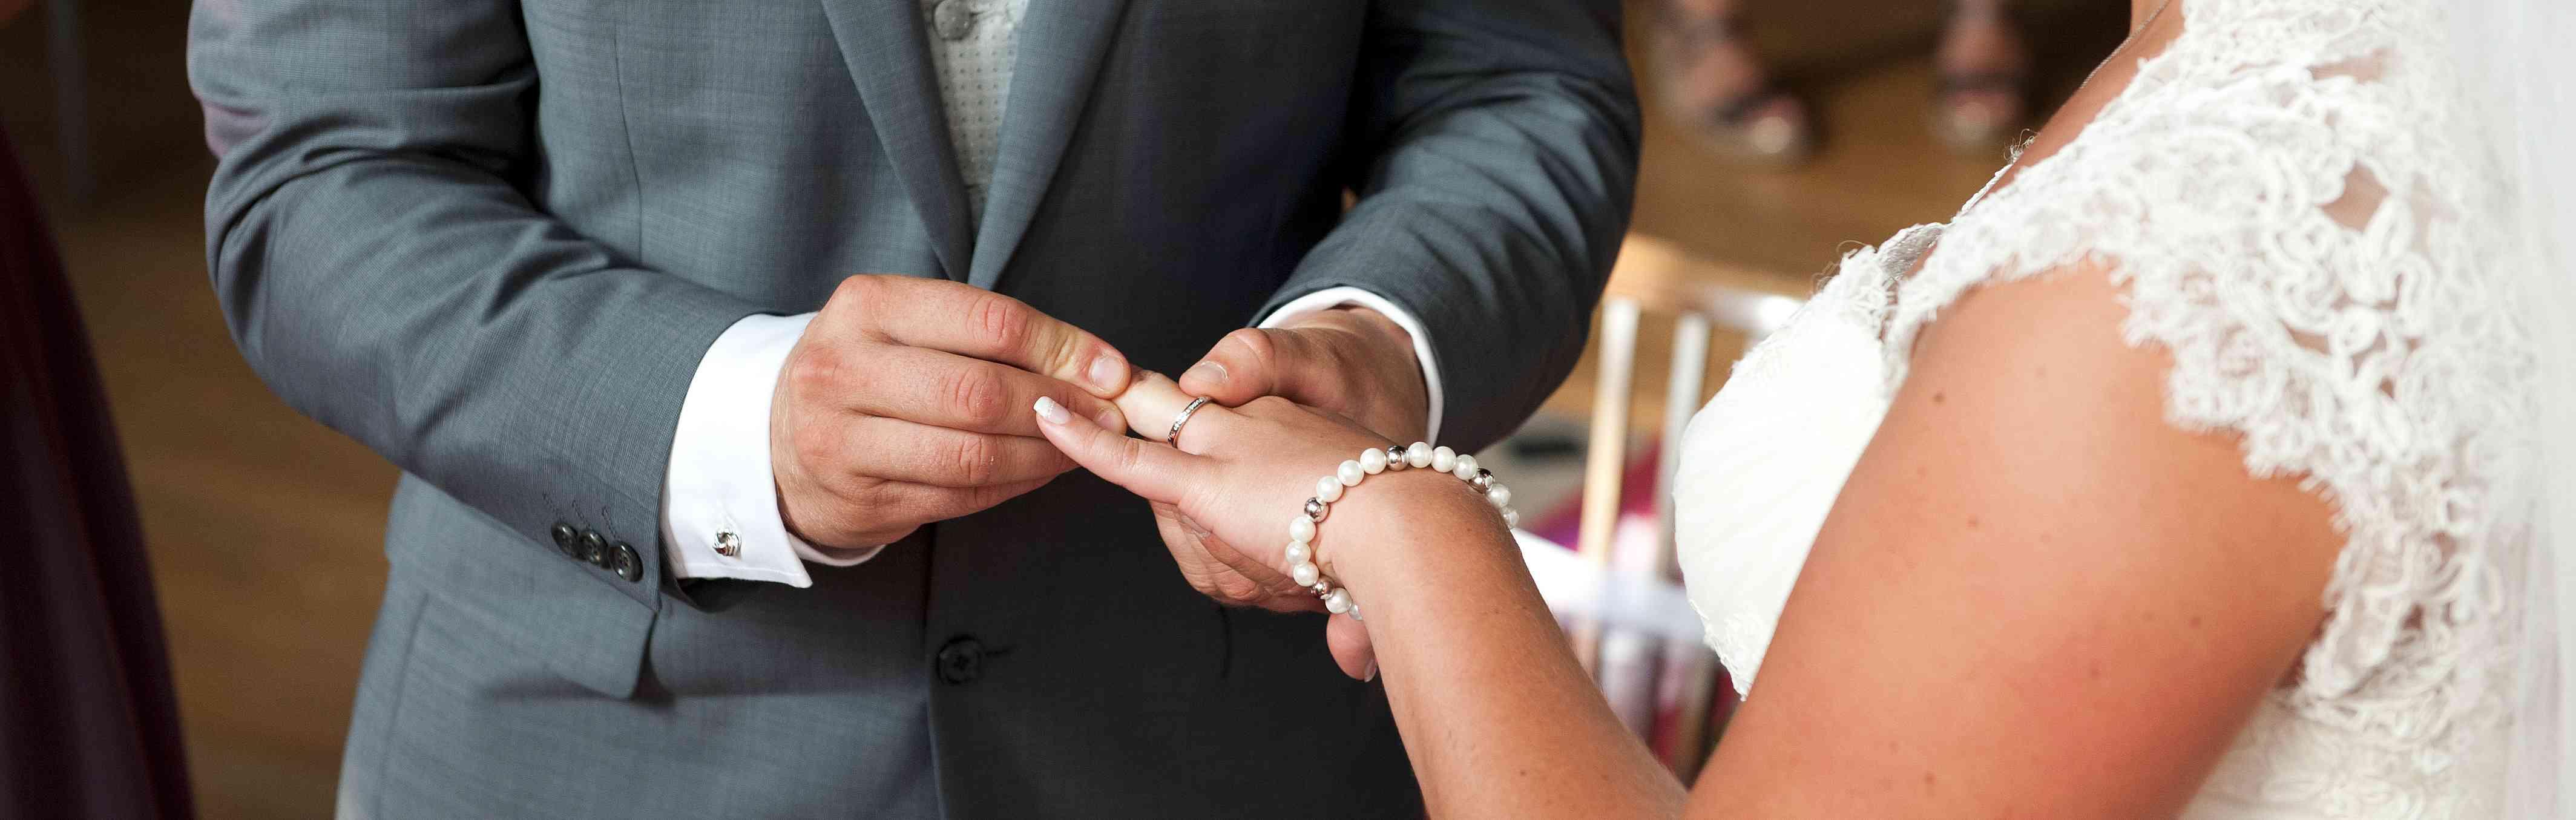 Photographe mariage Metz tarifs